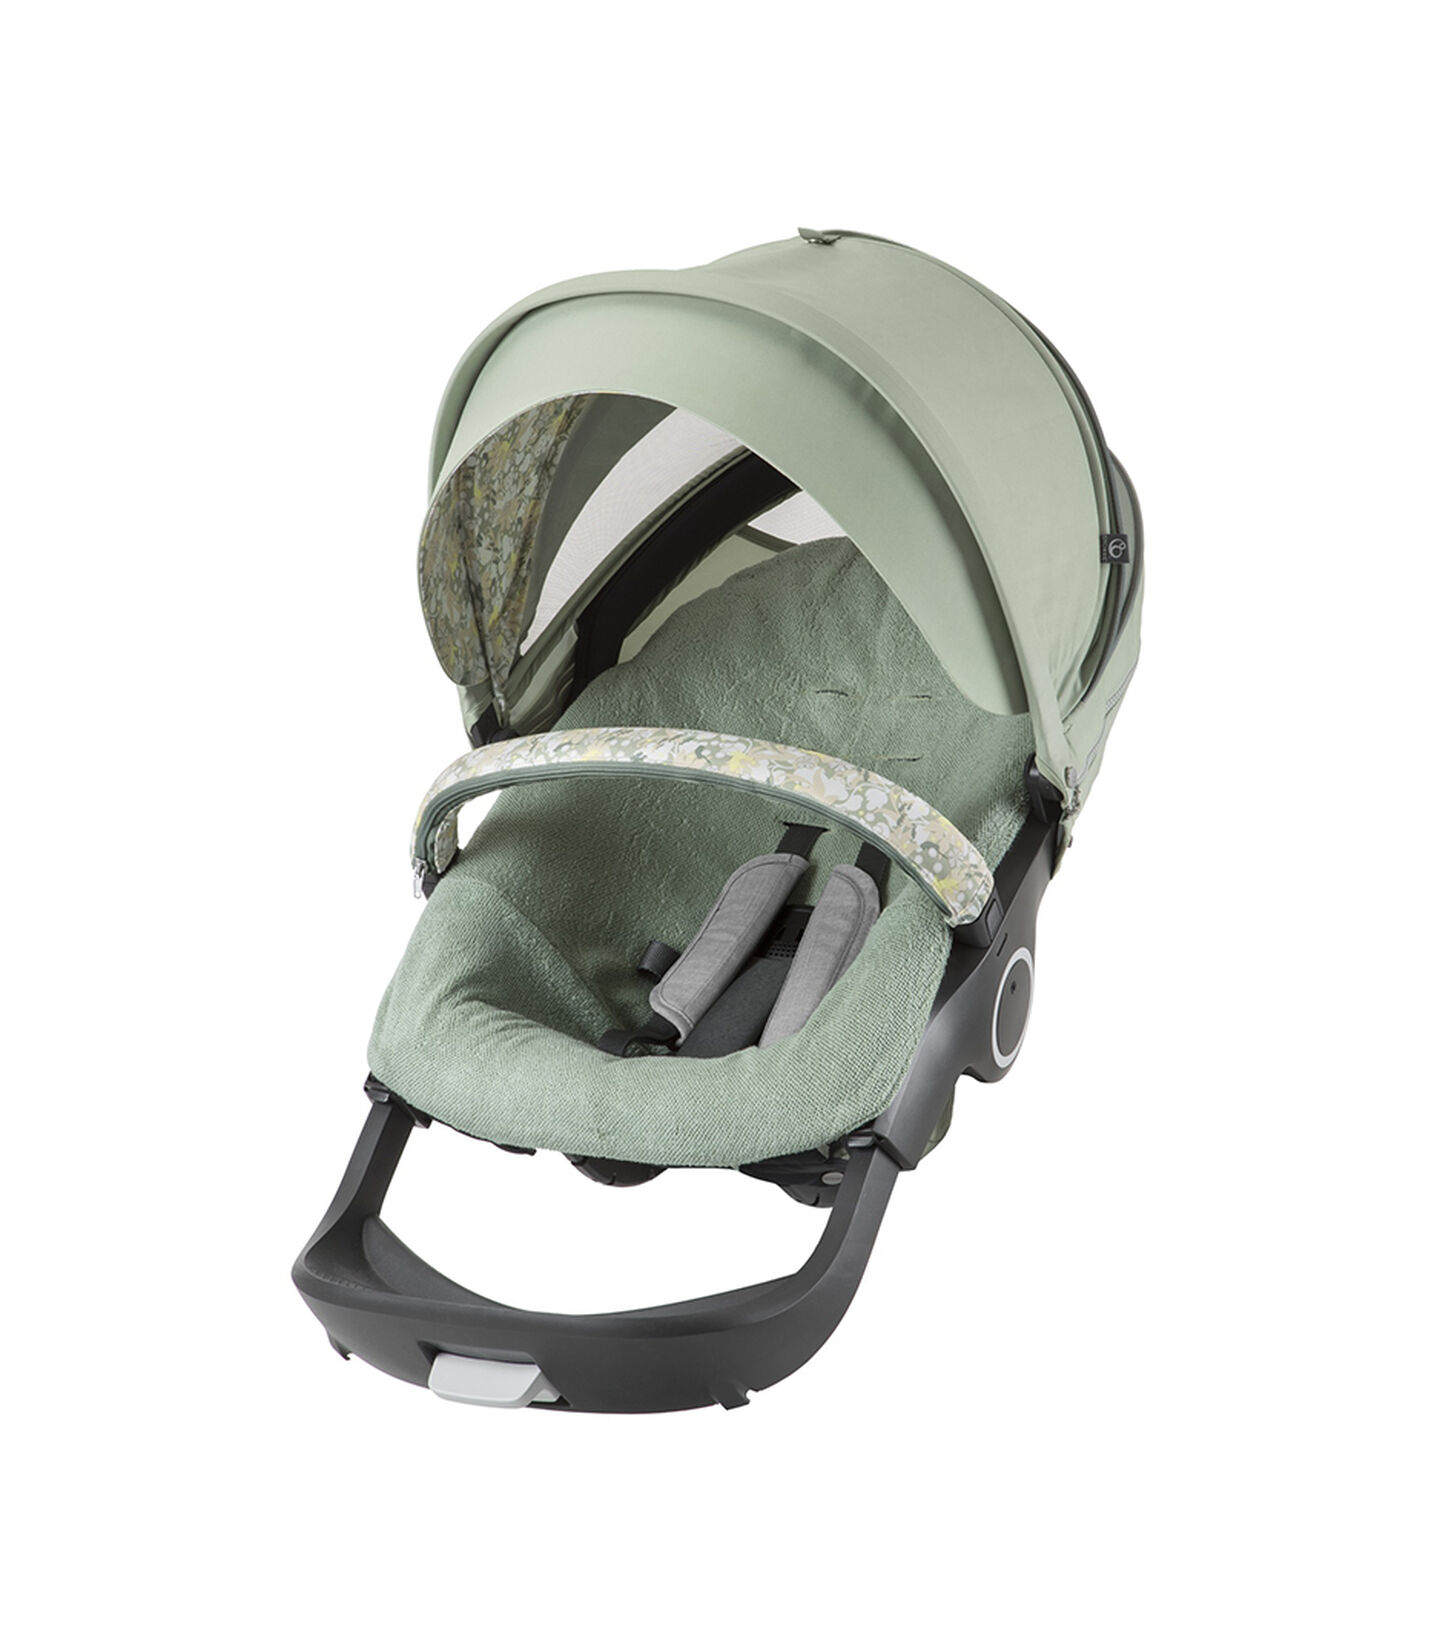 Stokke® Stroller seat with Flora Green Summer Kit.